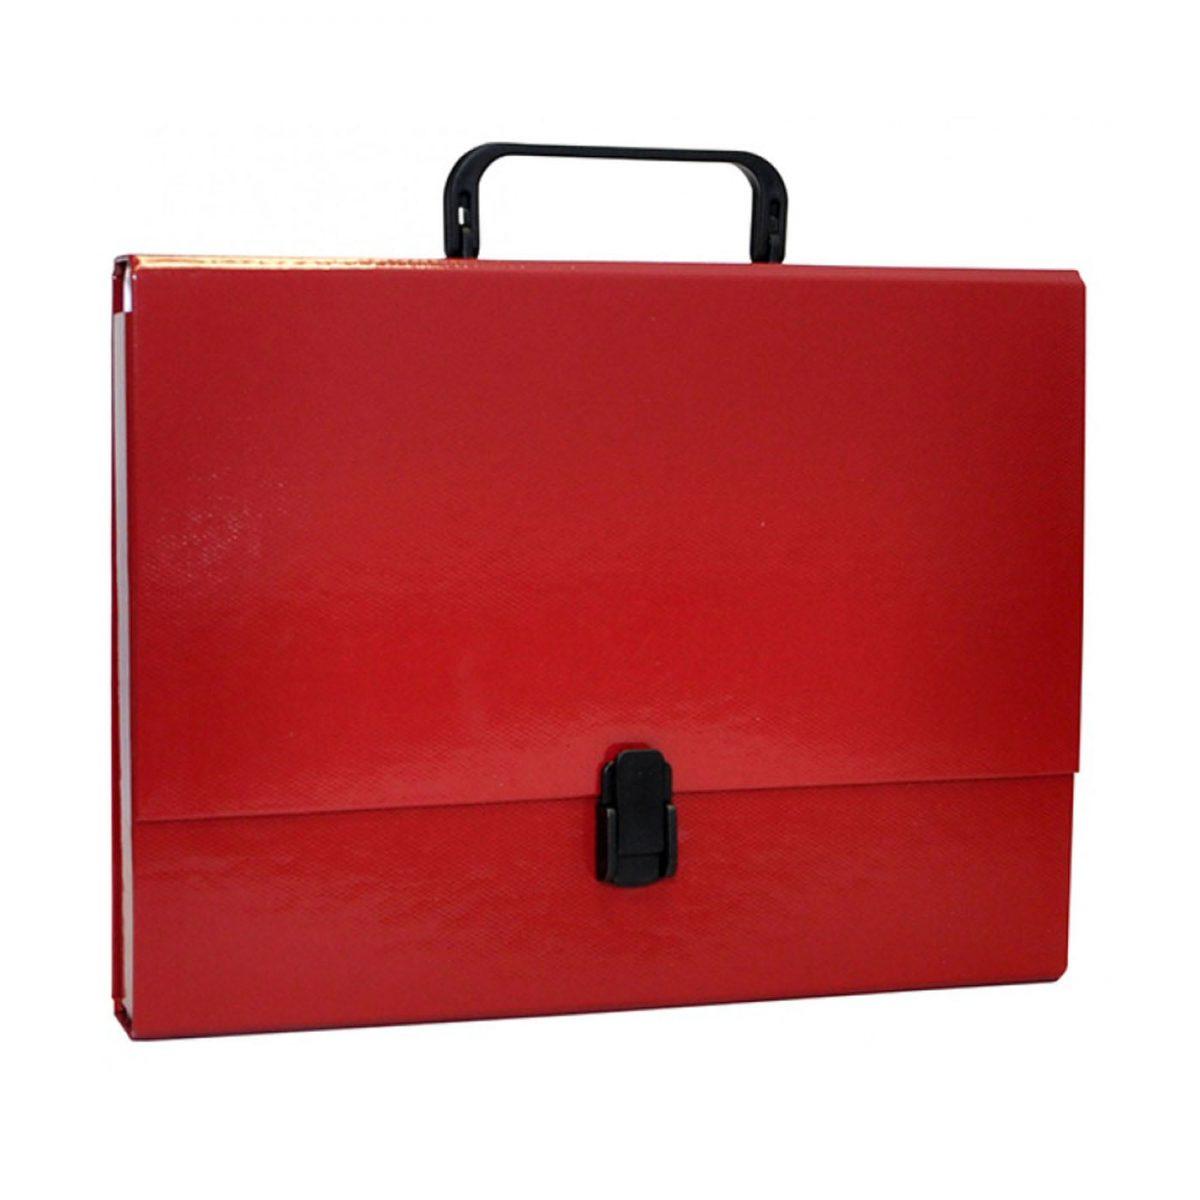 Servieta din carton laminat, A4/5cm, cu inchidere si maner, Office Products - visiniu